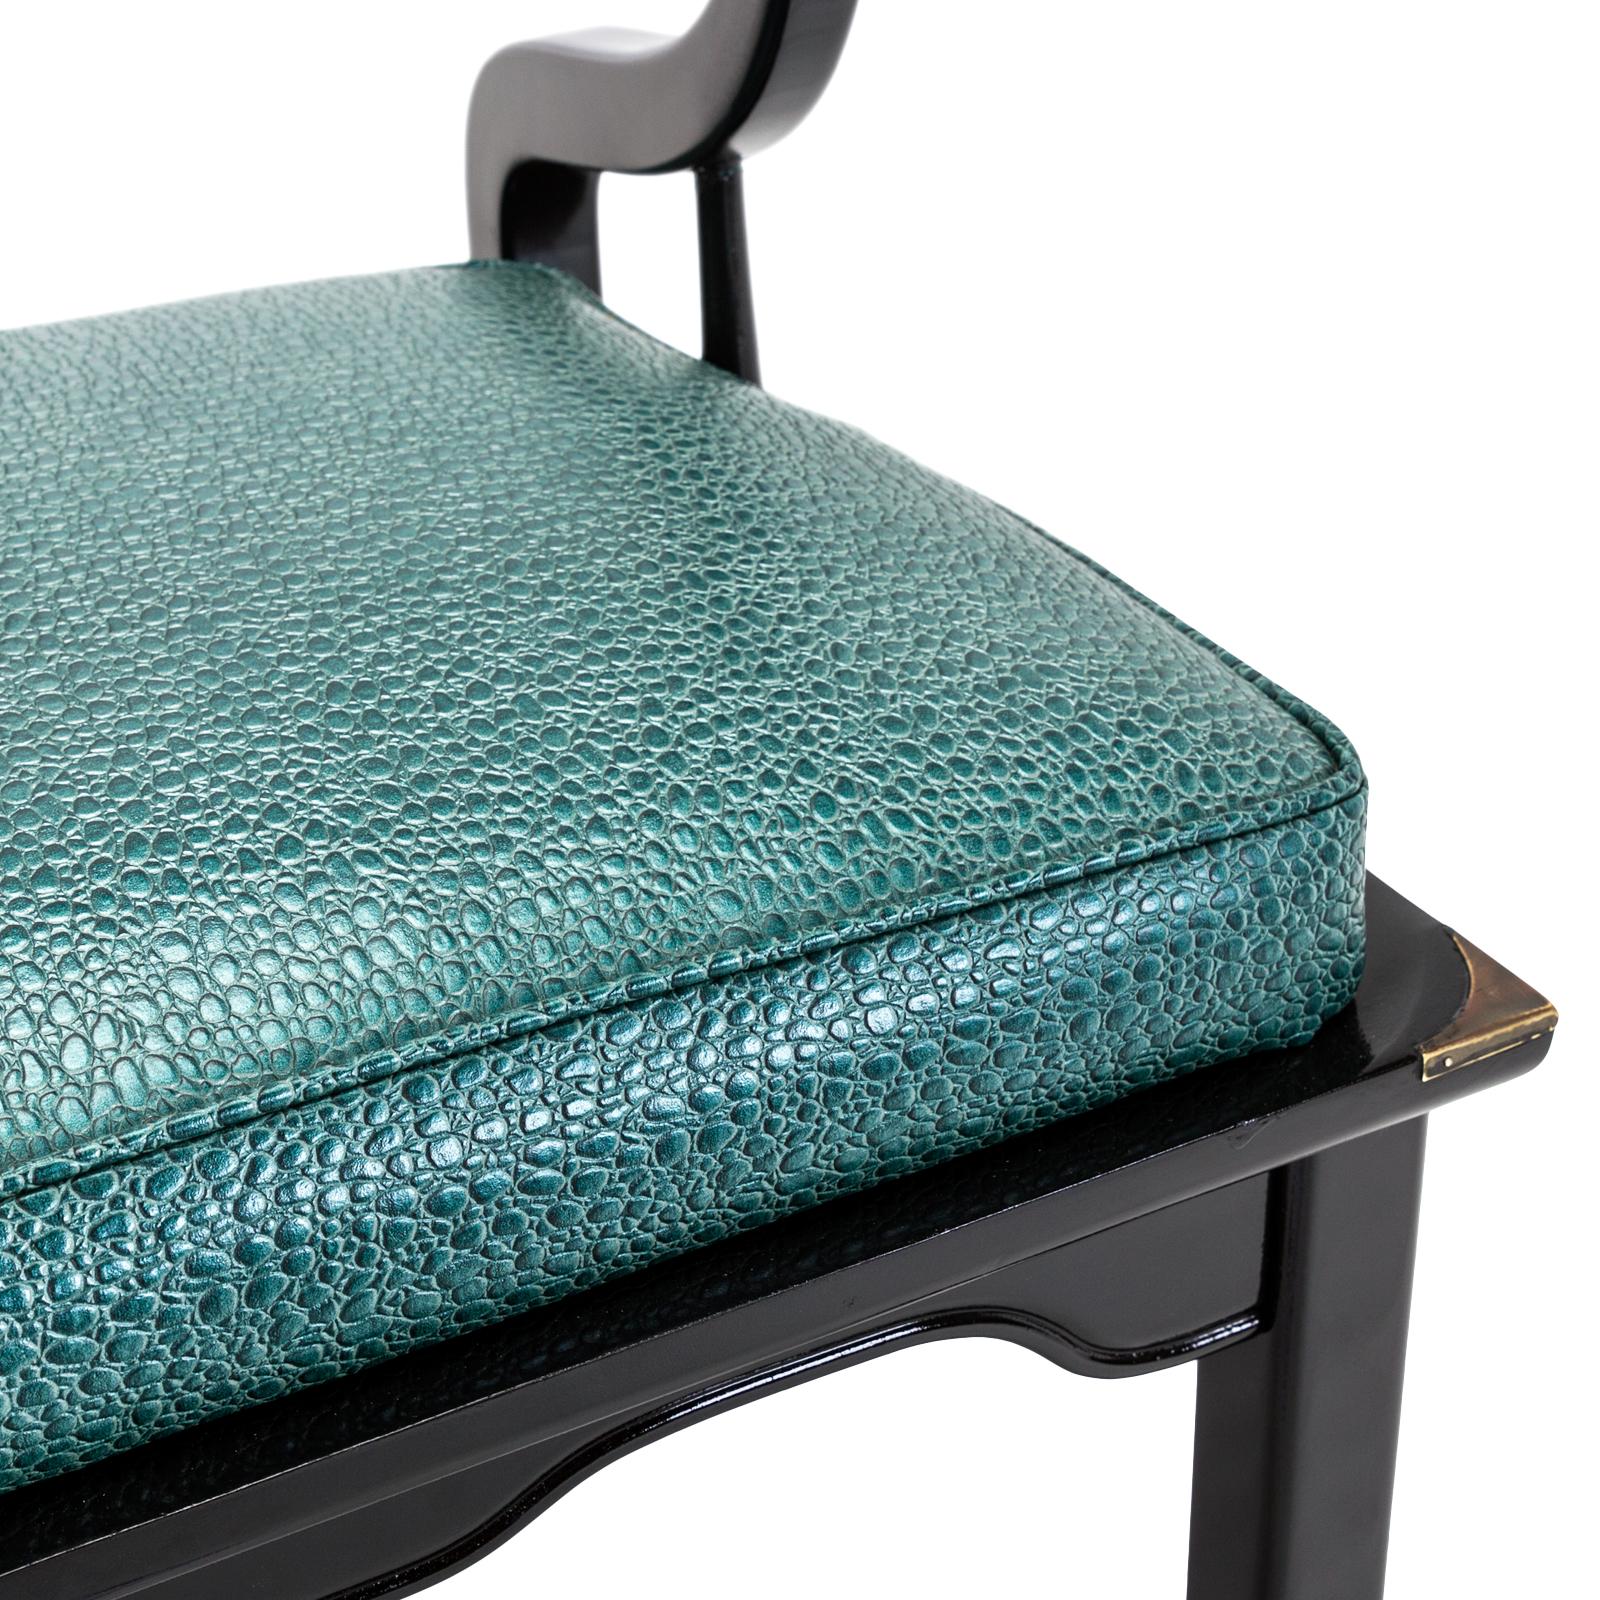 Horseshoe Lounge Chair Rentals